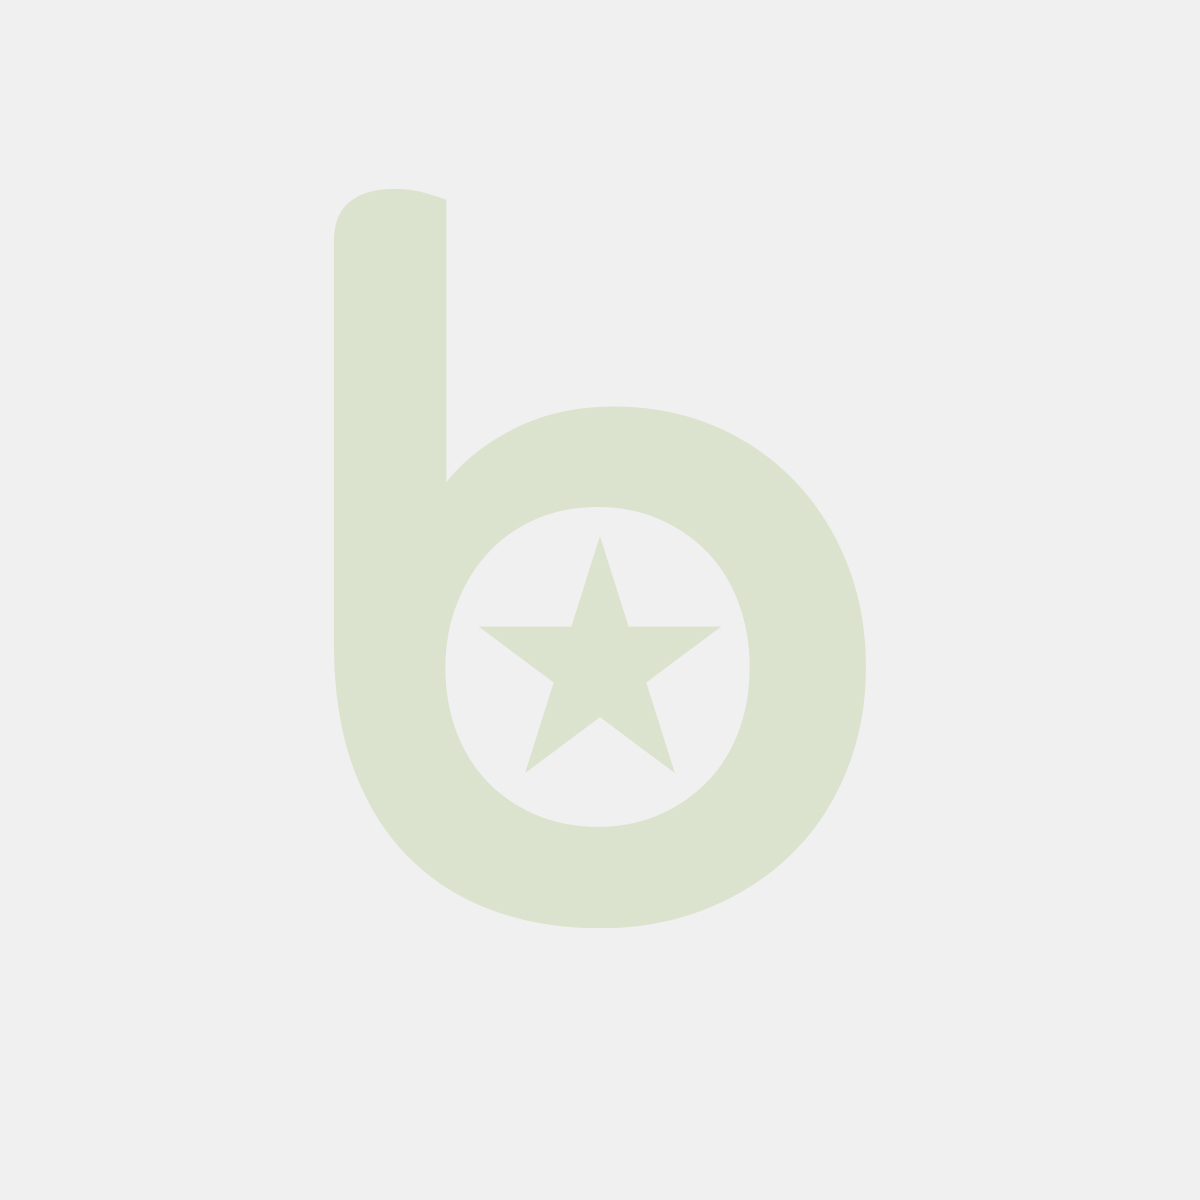 Rondel Profi Line Bez Pokrywki 2 L; Śr. 180 X 80 H